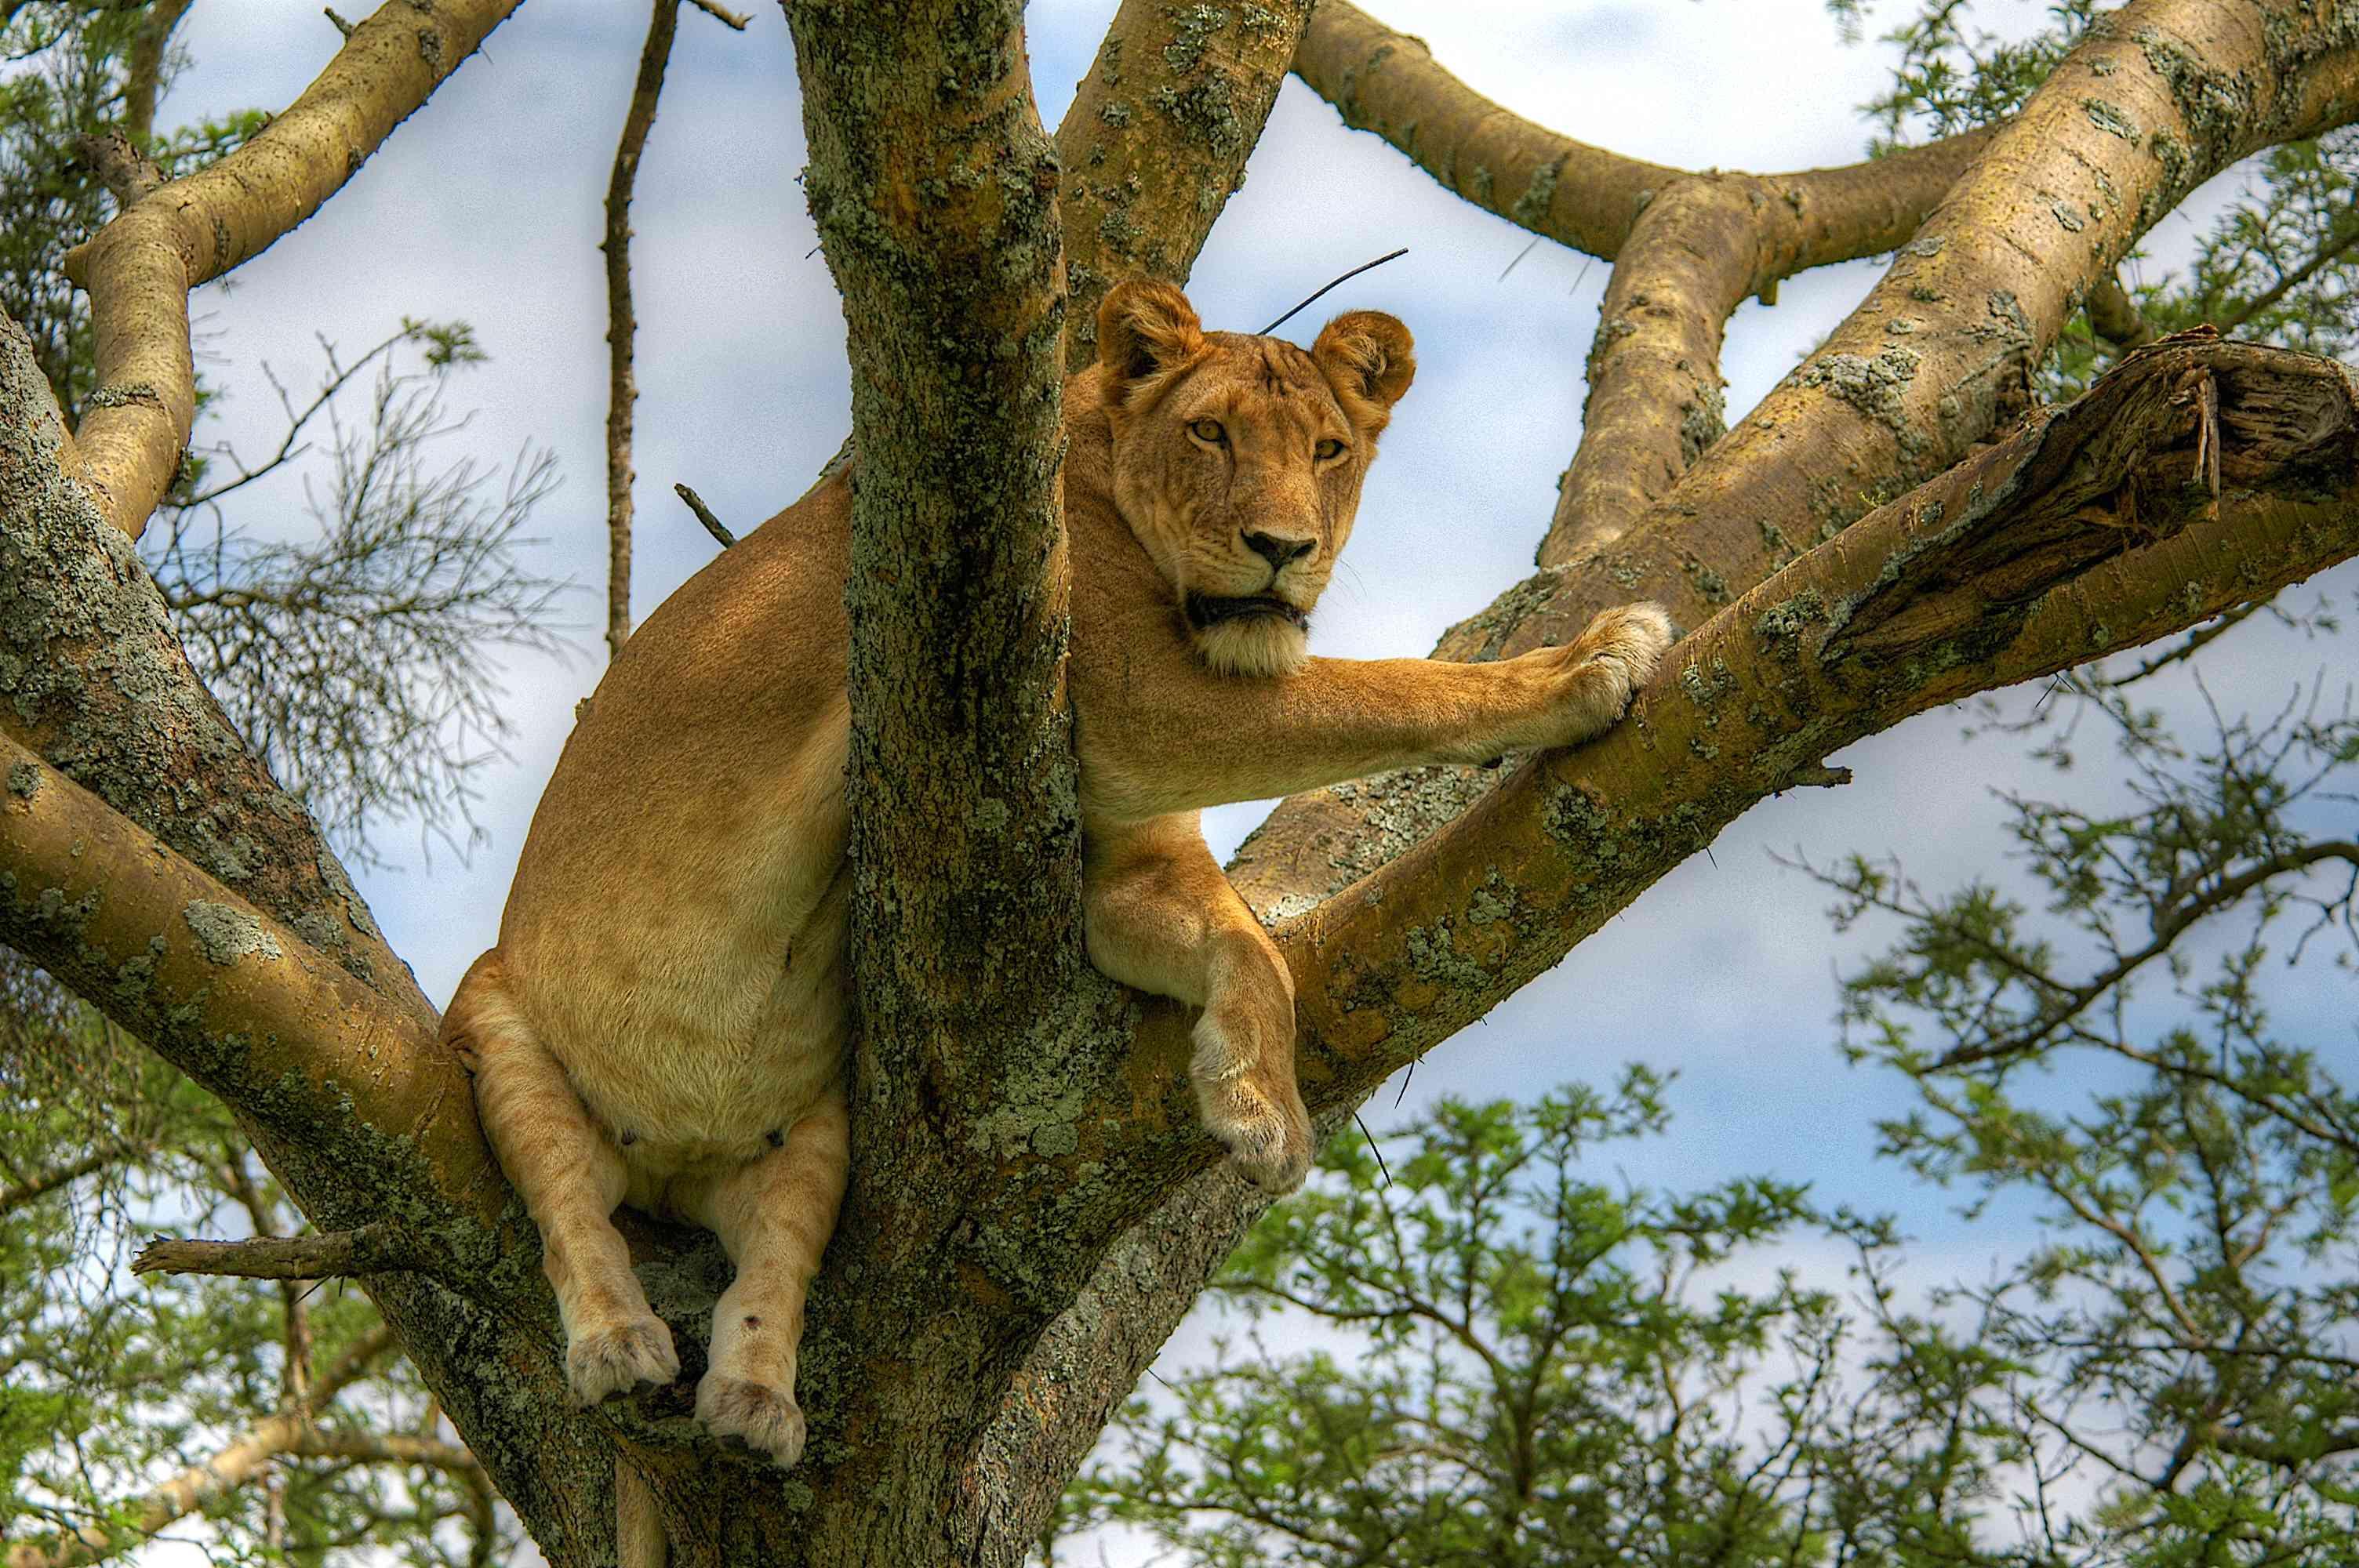 Tree-climbing lion in Queen Elizabeth National Park, Uganda